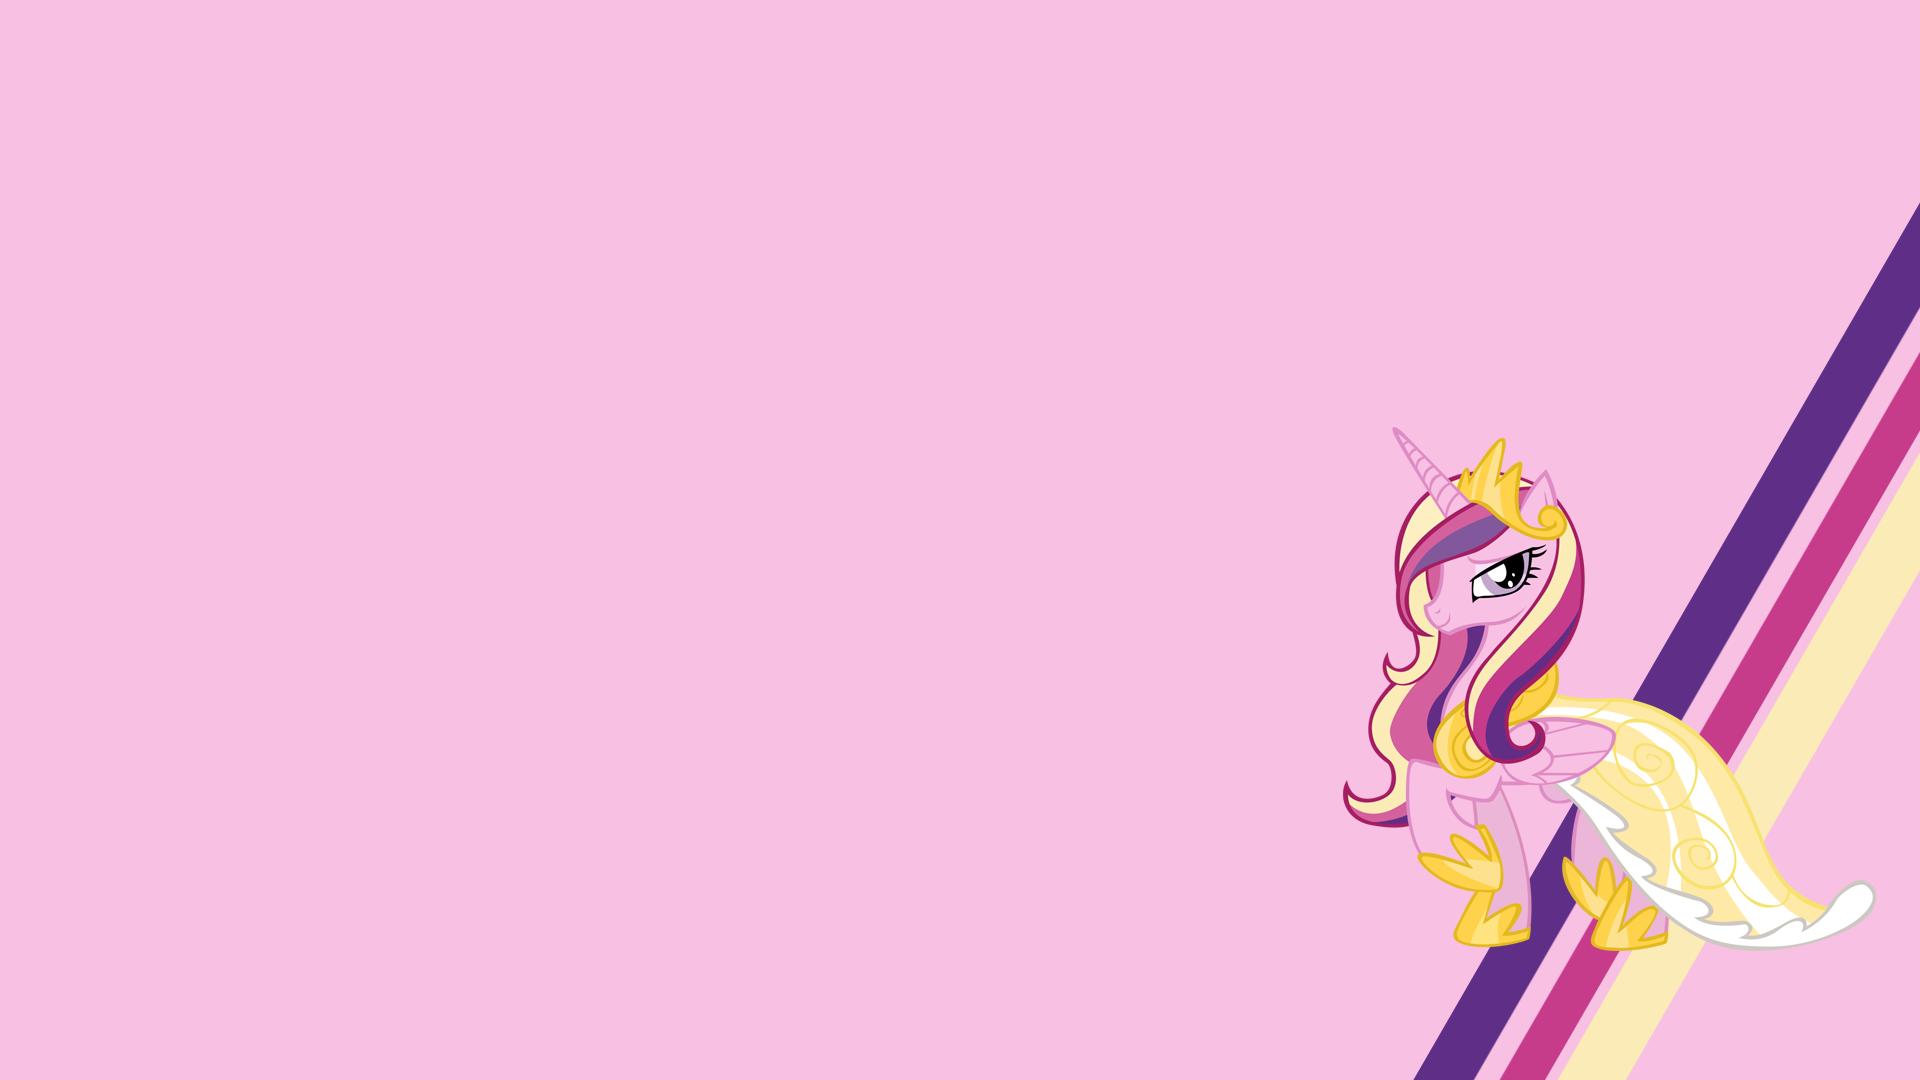 Princess Cadence Wallpaper by NinjaBaby2099